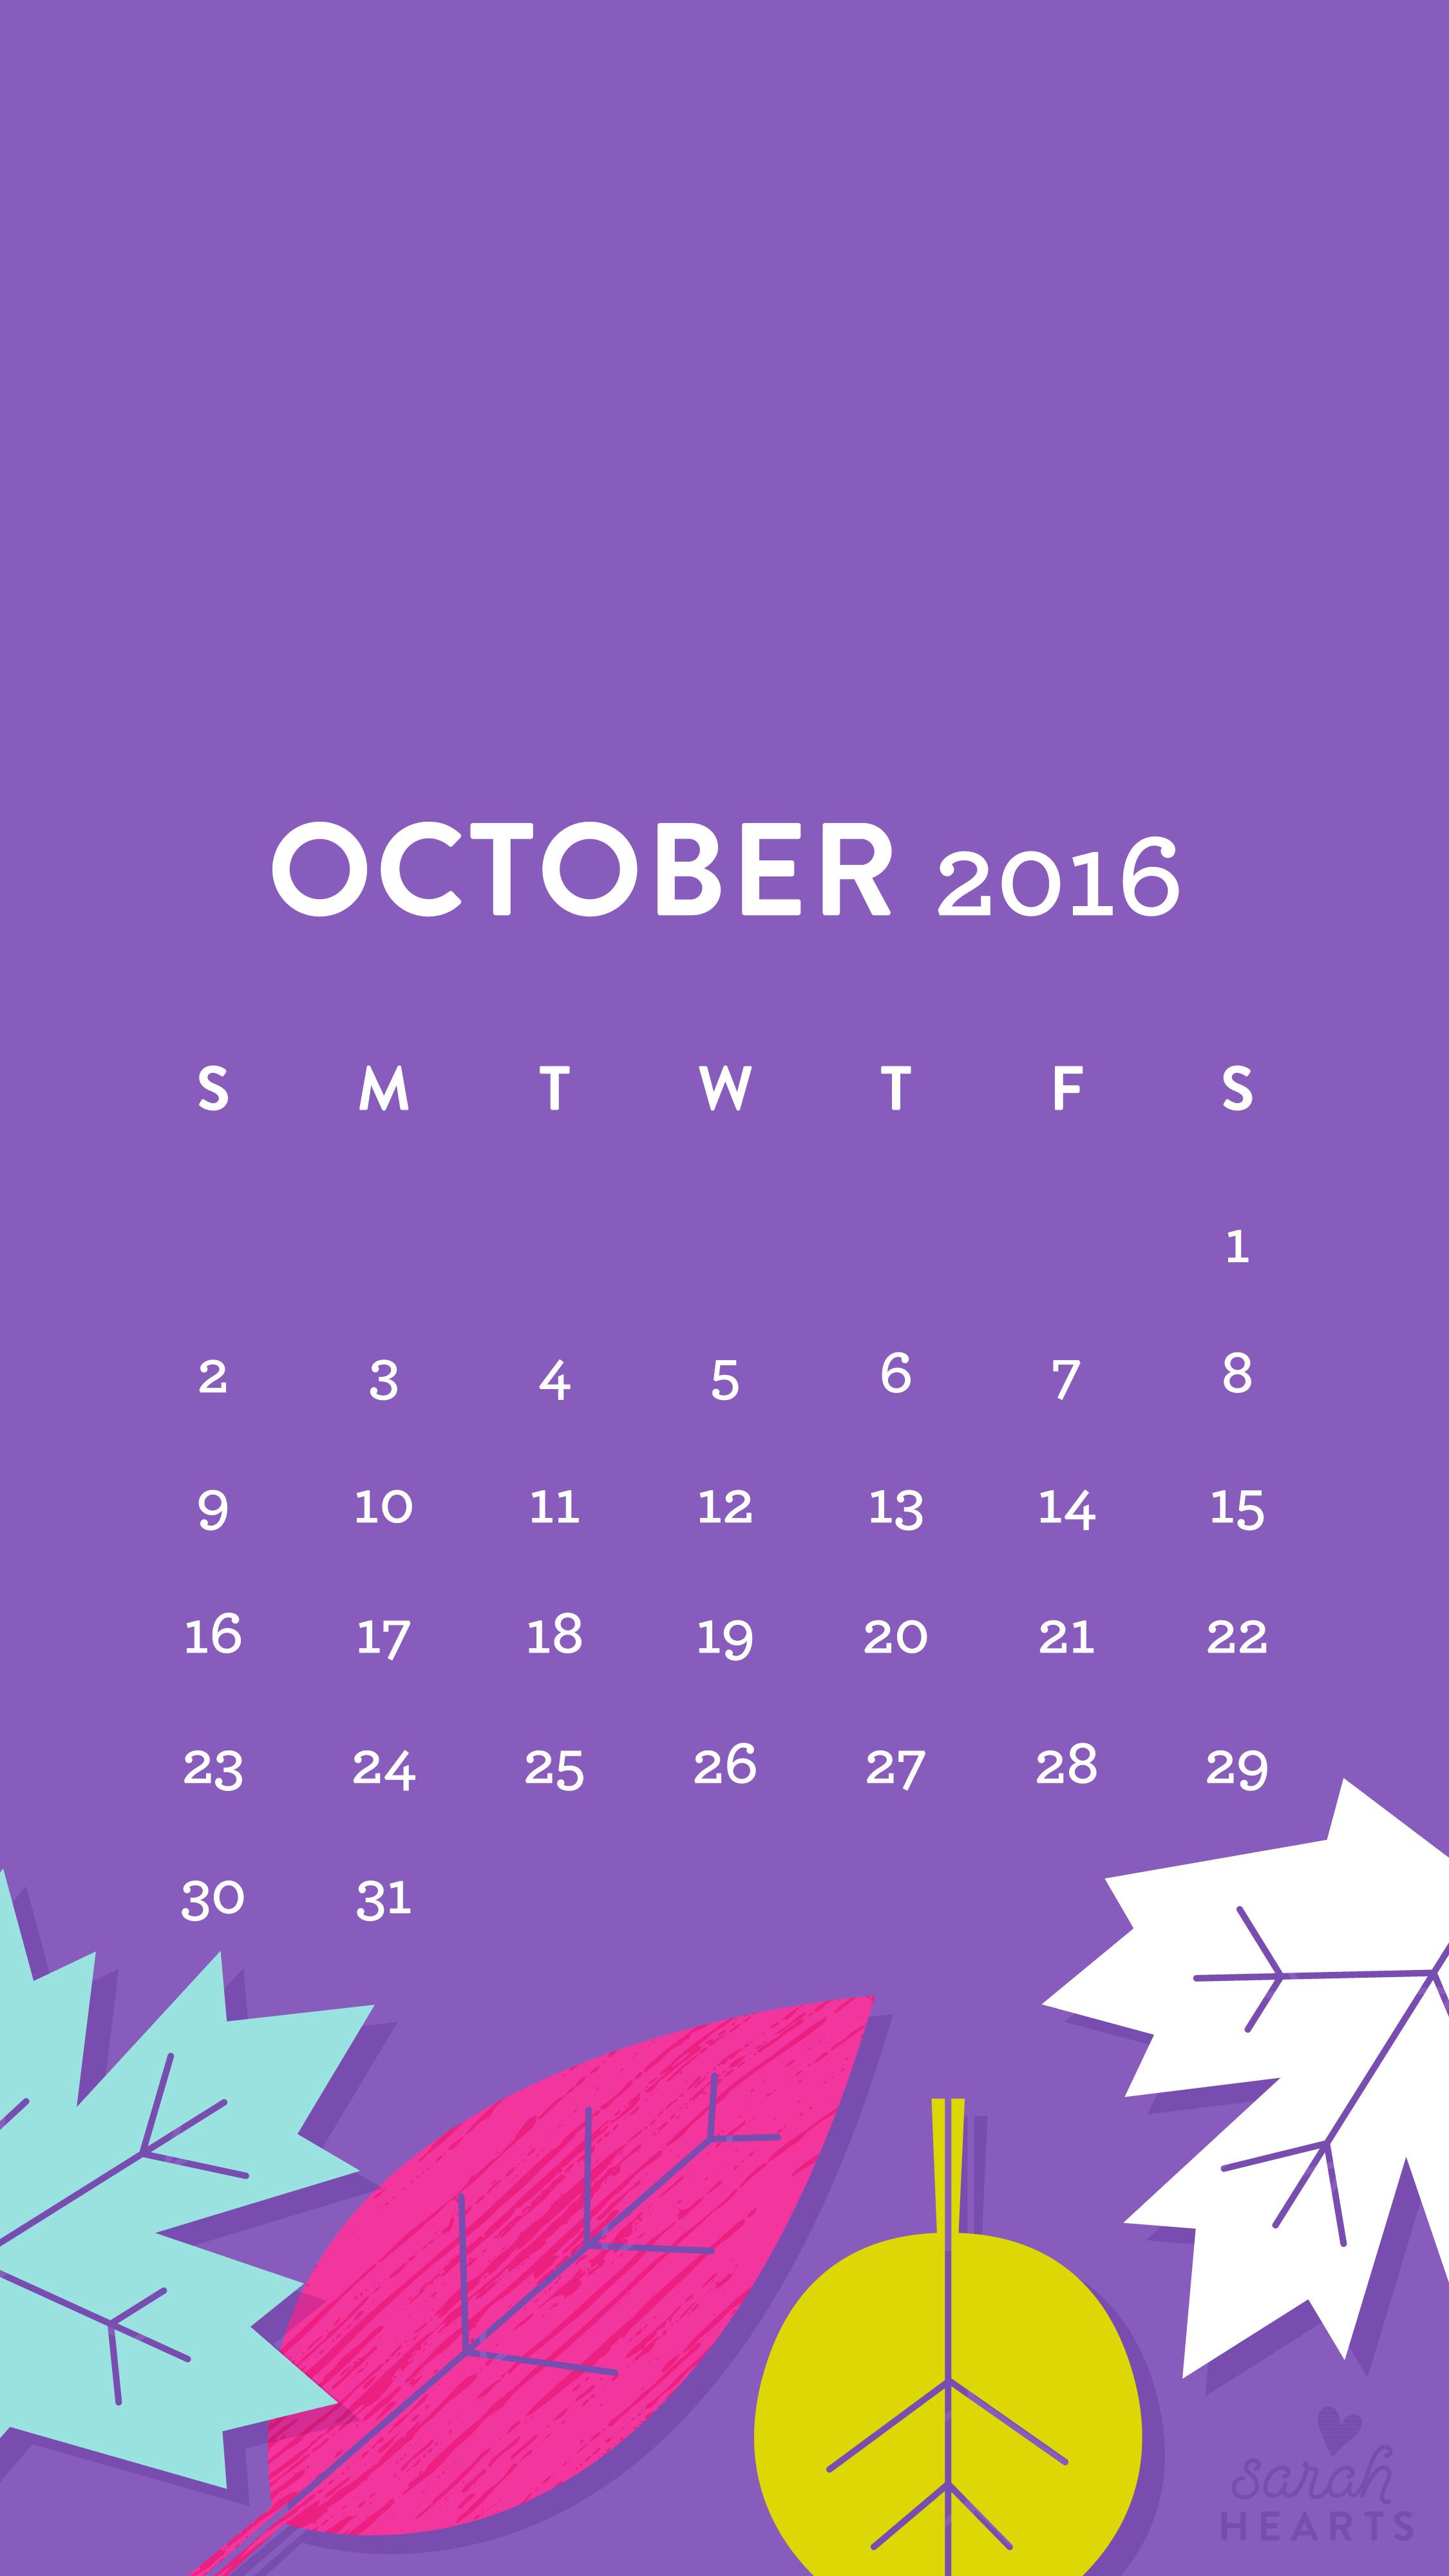 October 2016 Fall Leaves Calendar Wallpapers Sarah Hearts